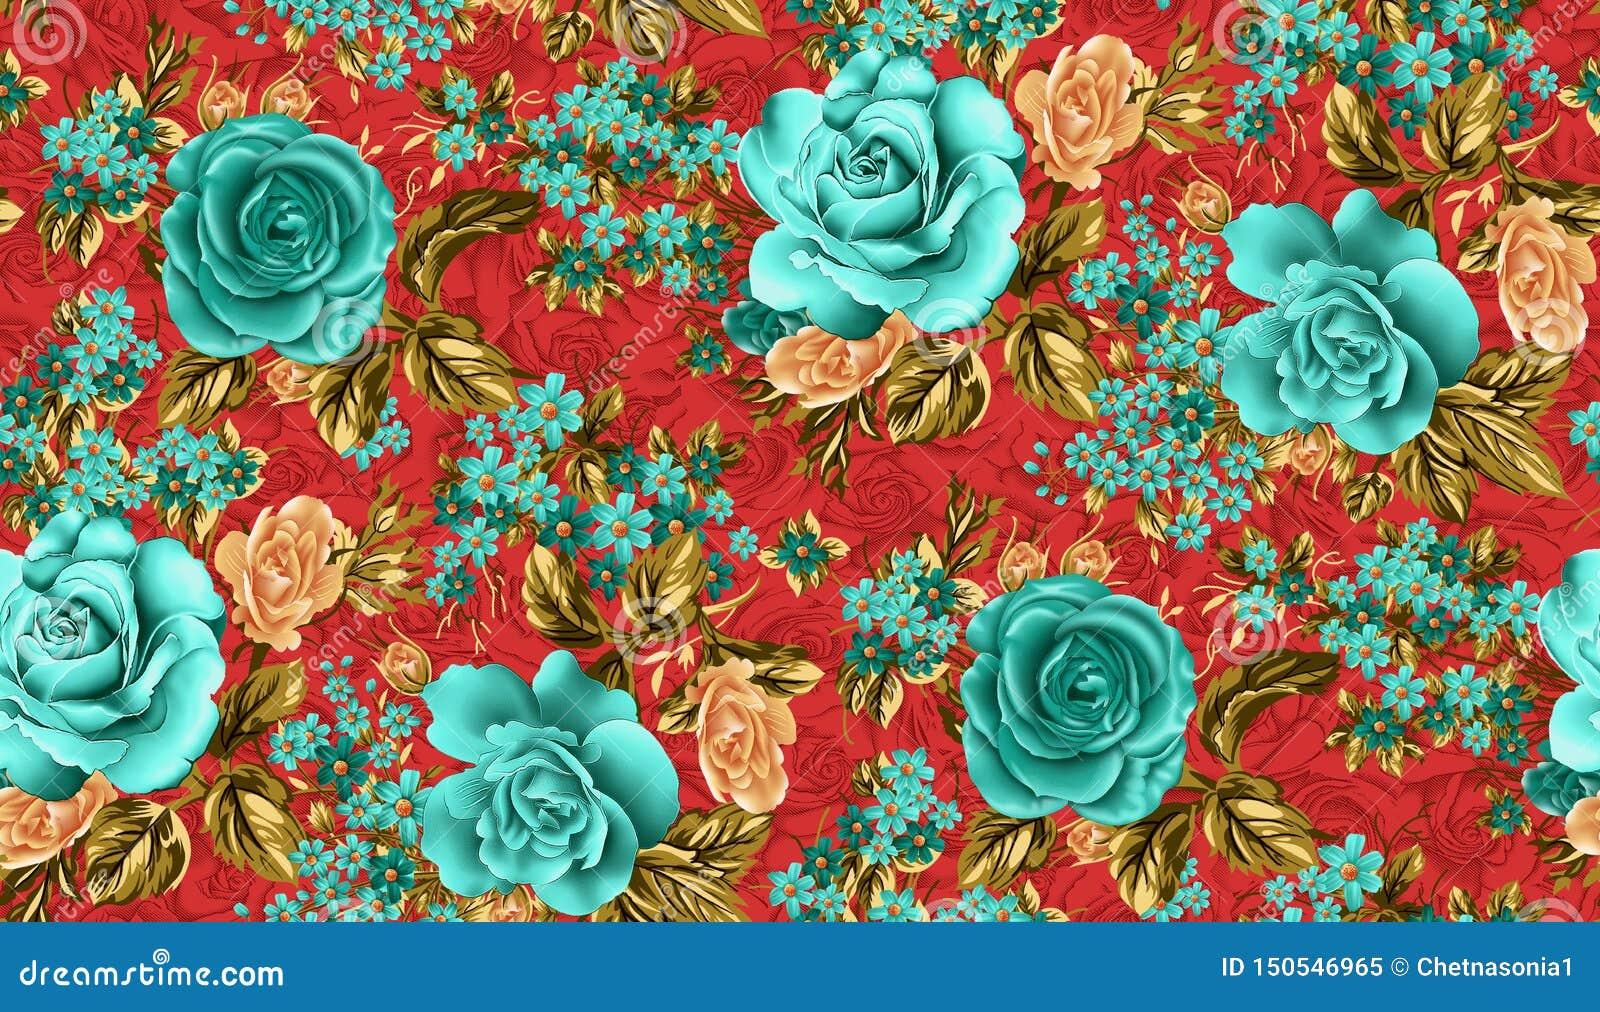 Seamless beautiful flower pattern red background